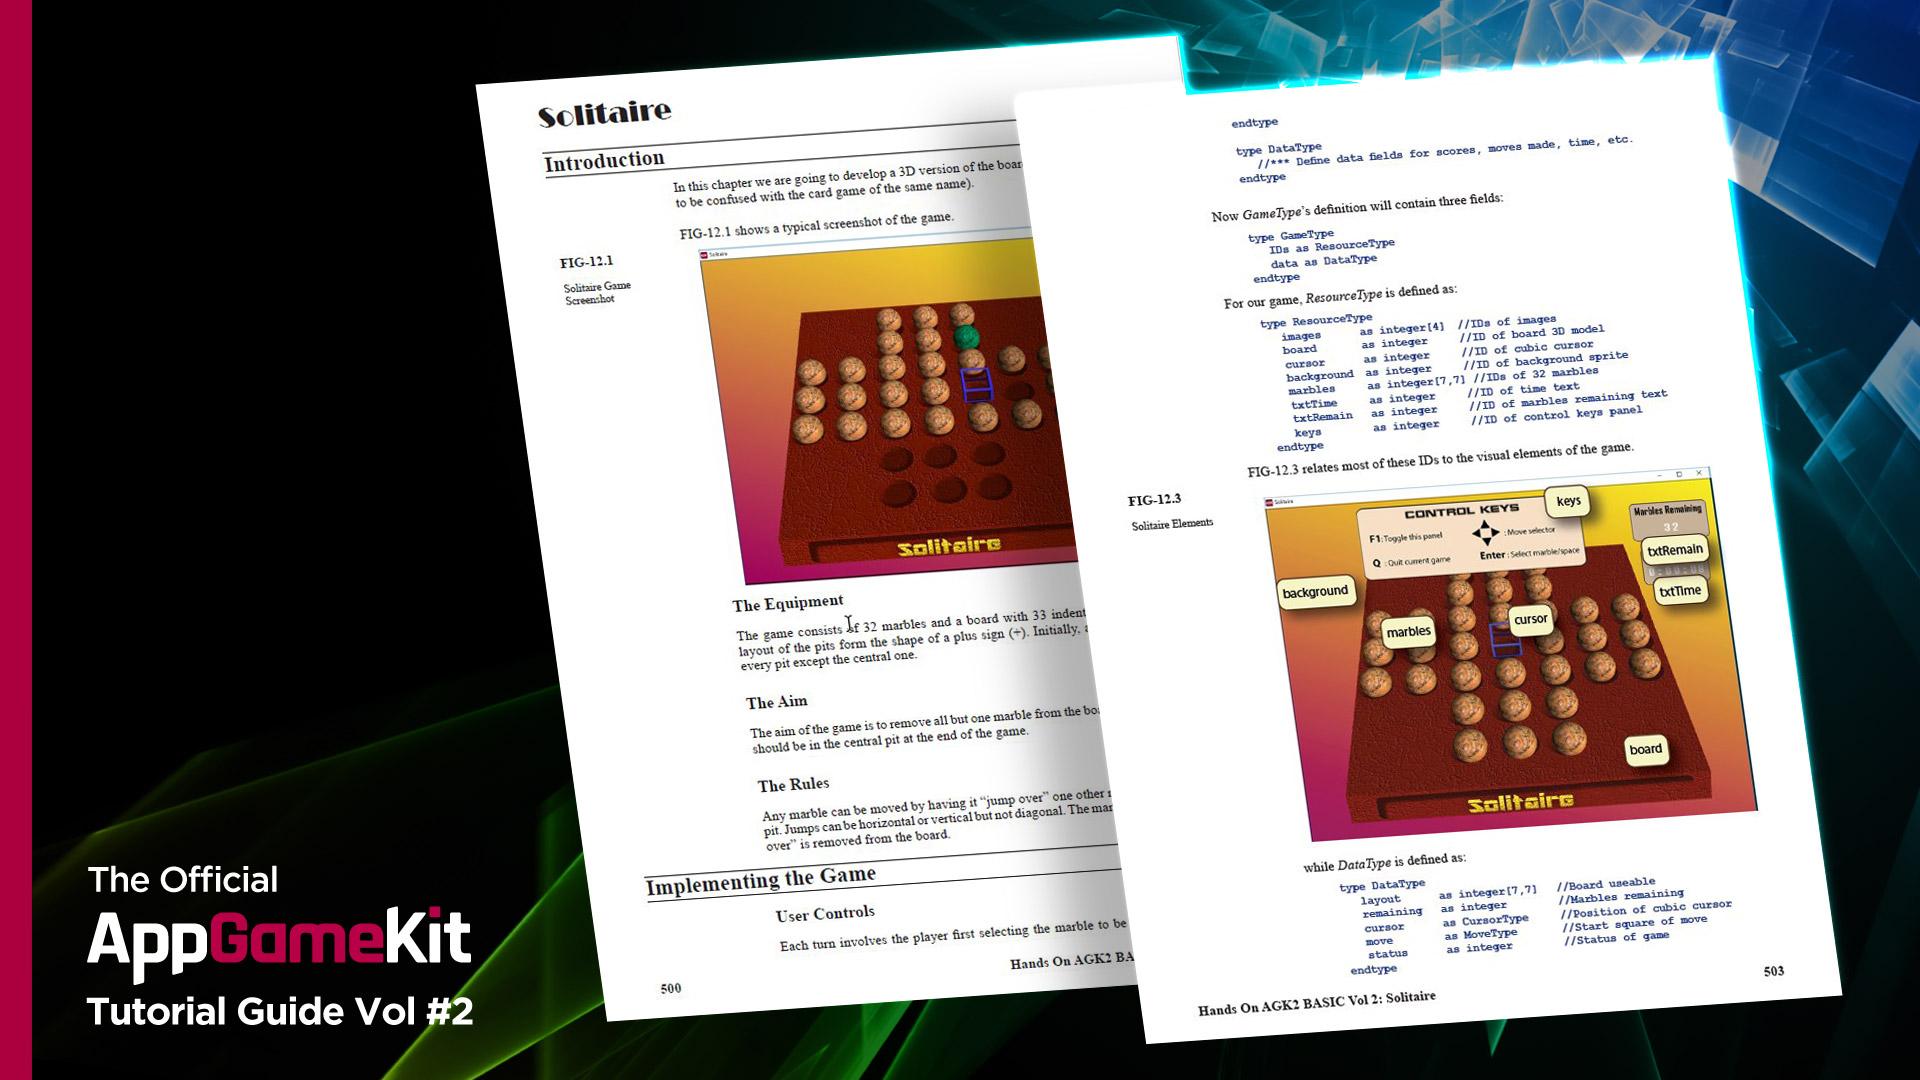 AppGameKit - AppGameKit Official Tutorial Guide Vol 2